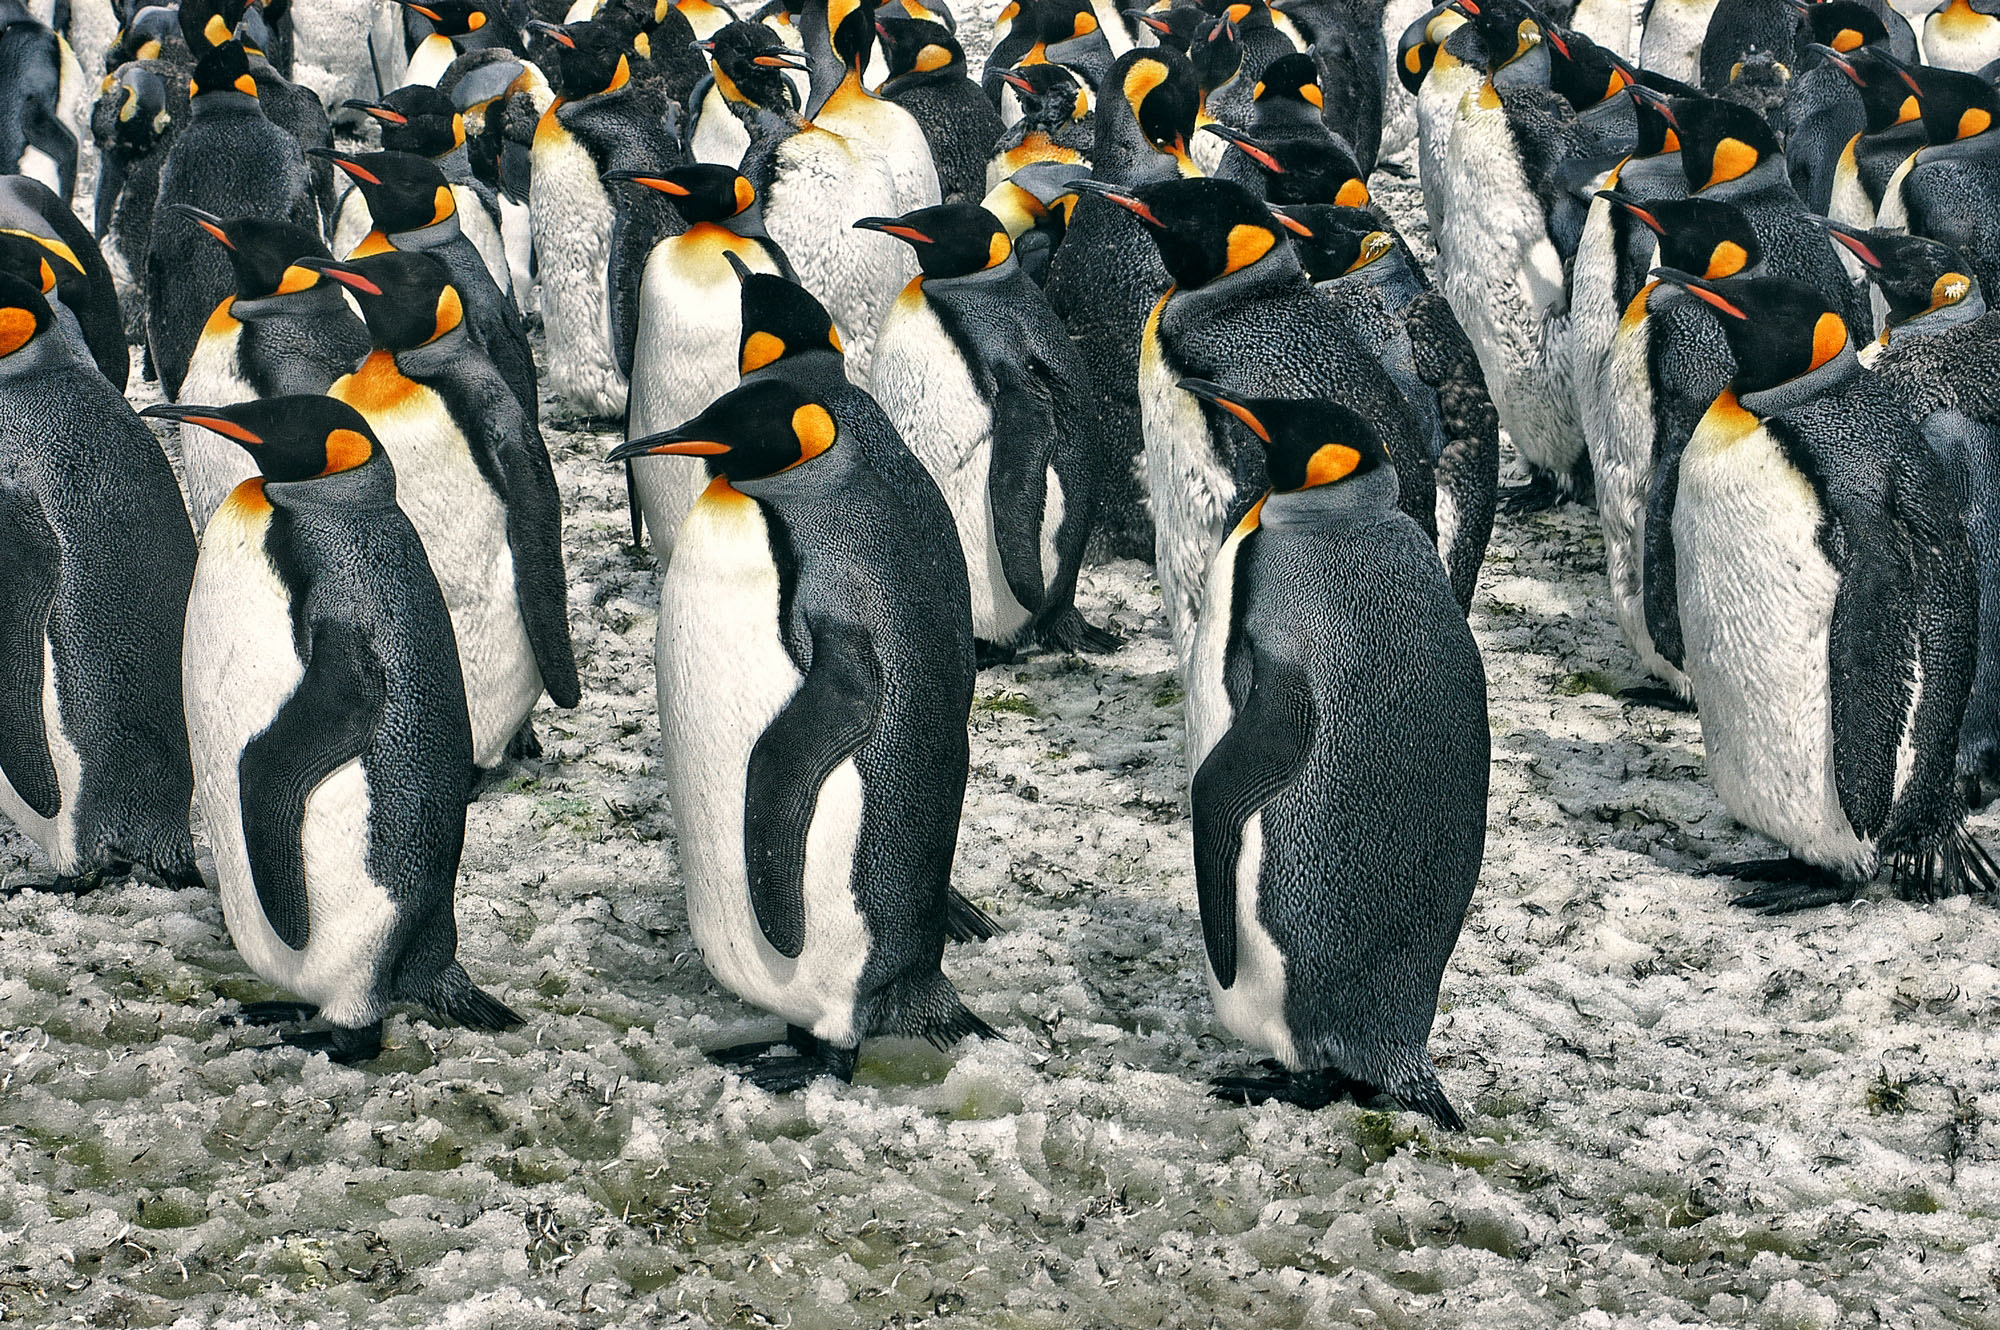 Pingüinos Rey, Fortuna Bay.